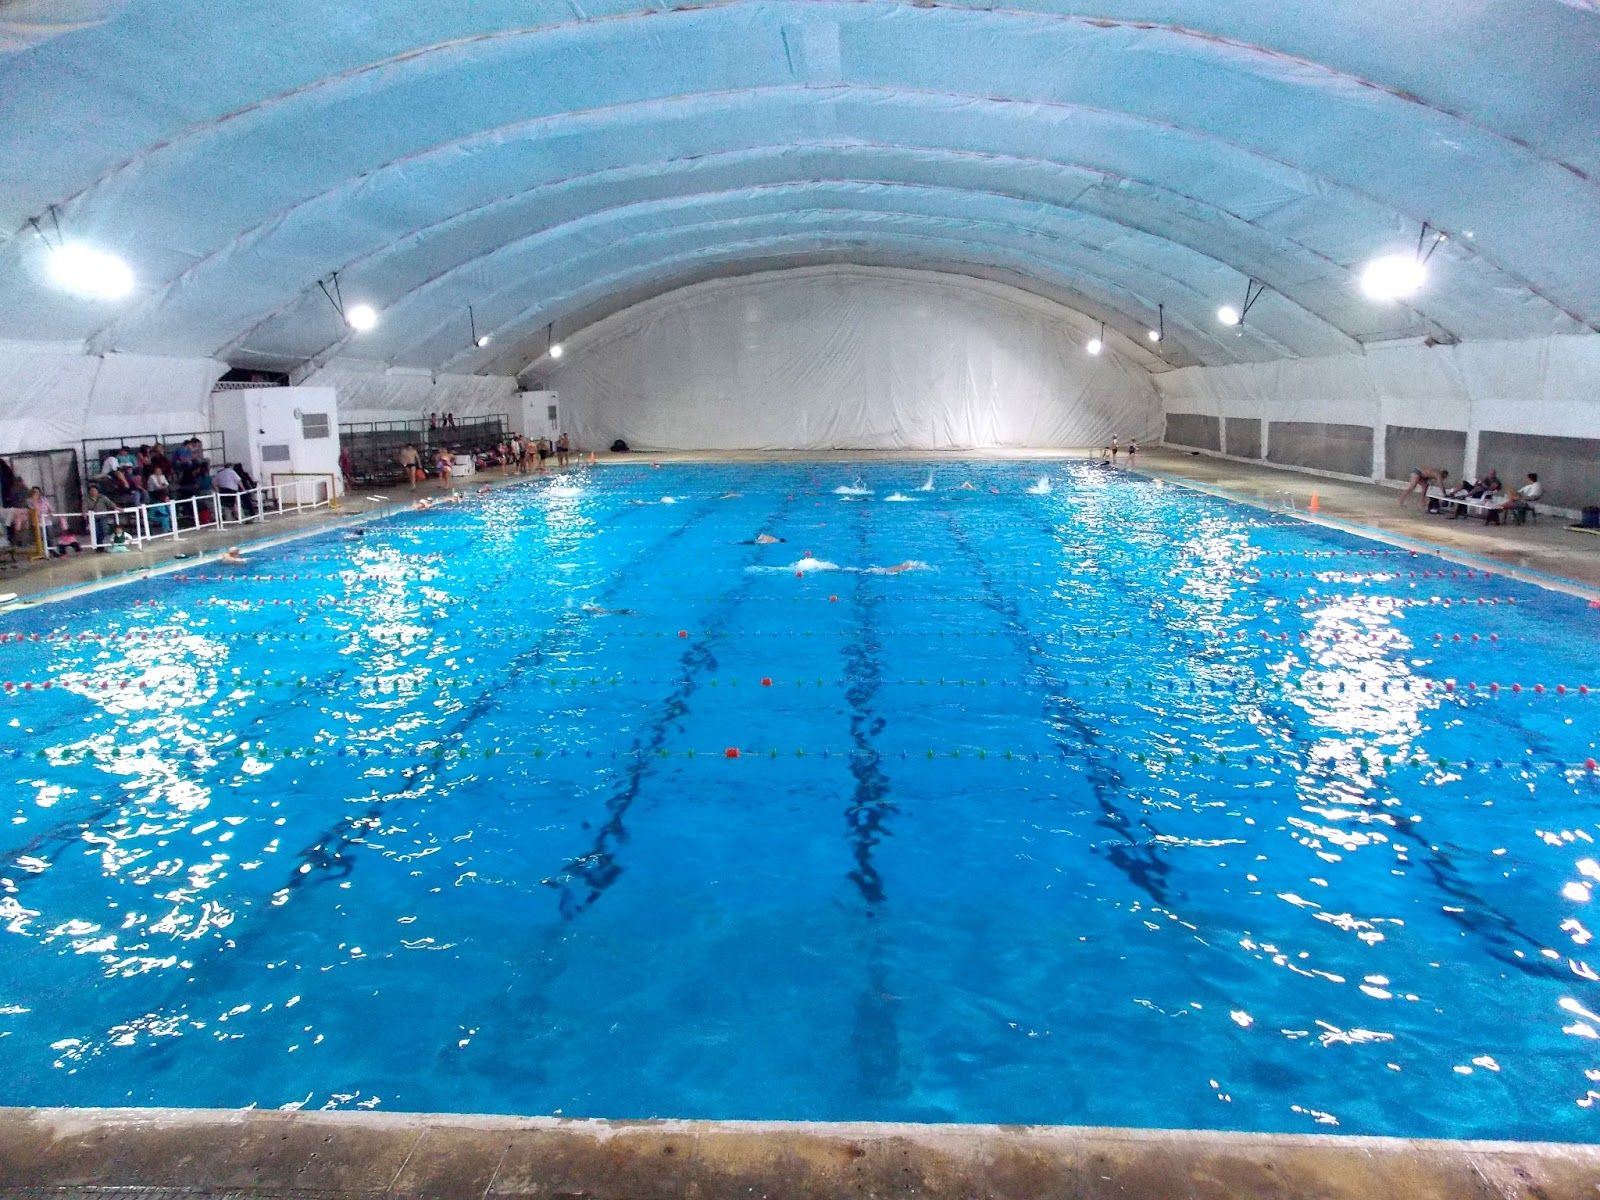 Deportes san isidro for Imagenes de piletas de natacion